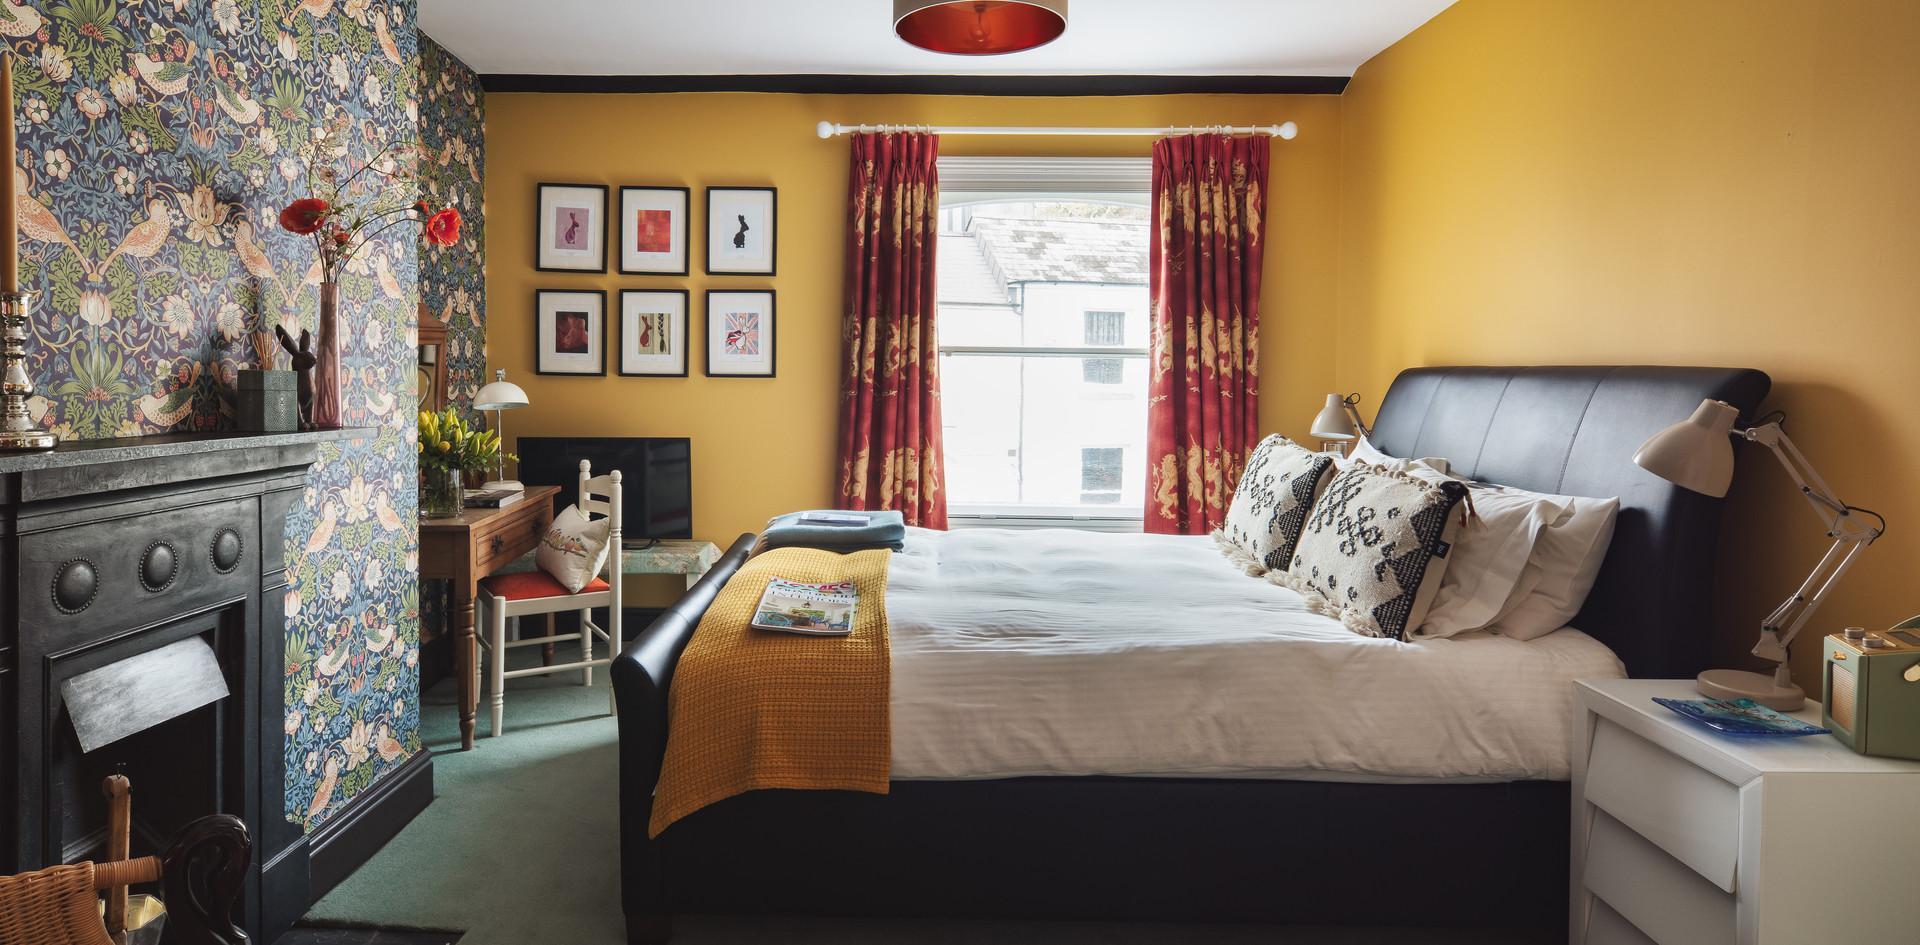 Crown bedroom